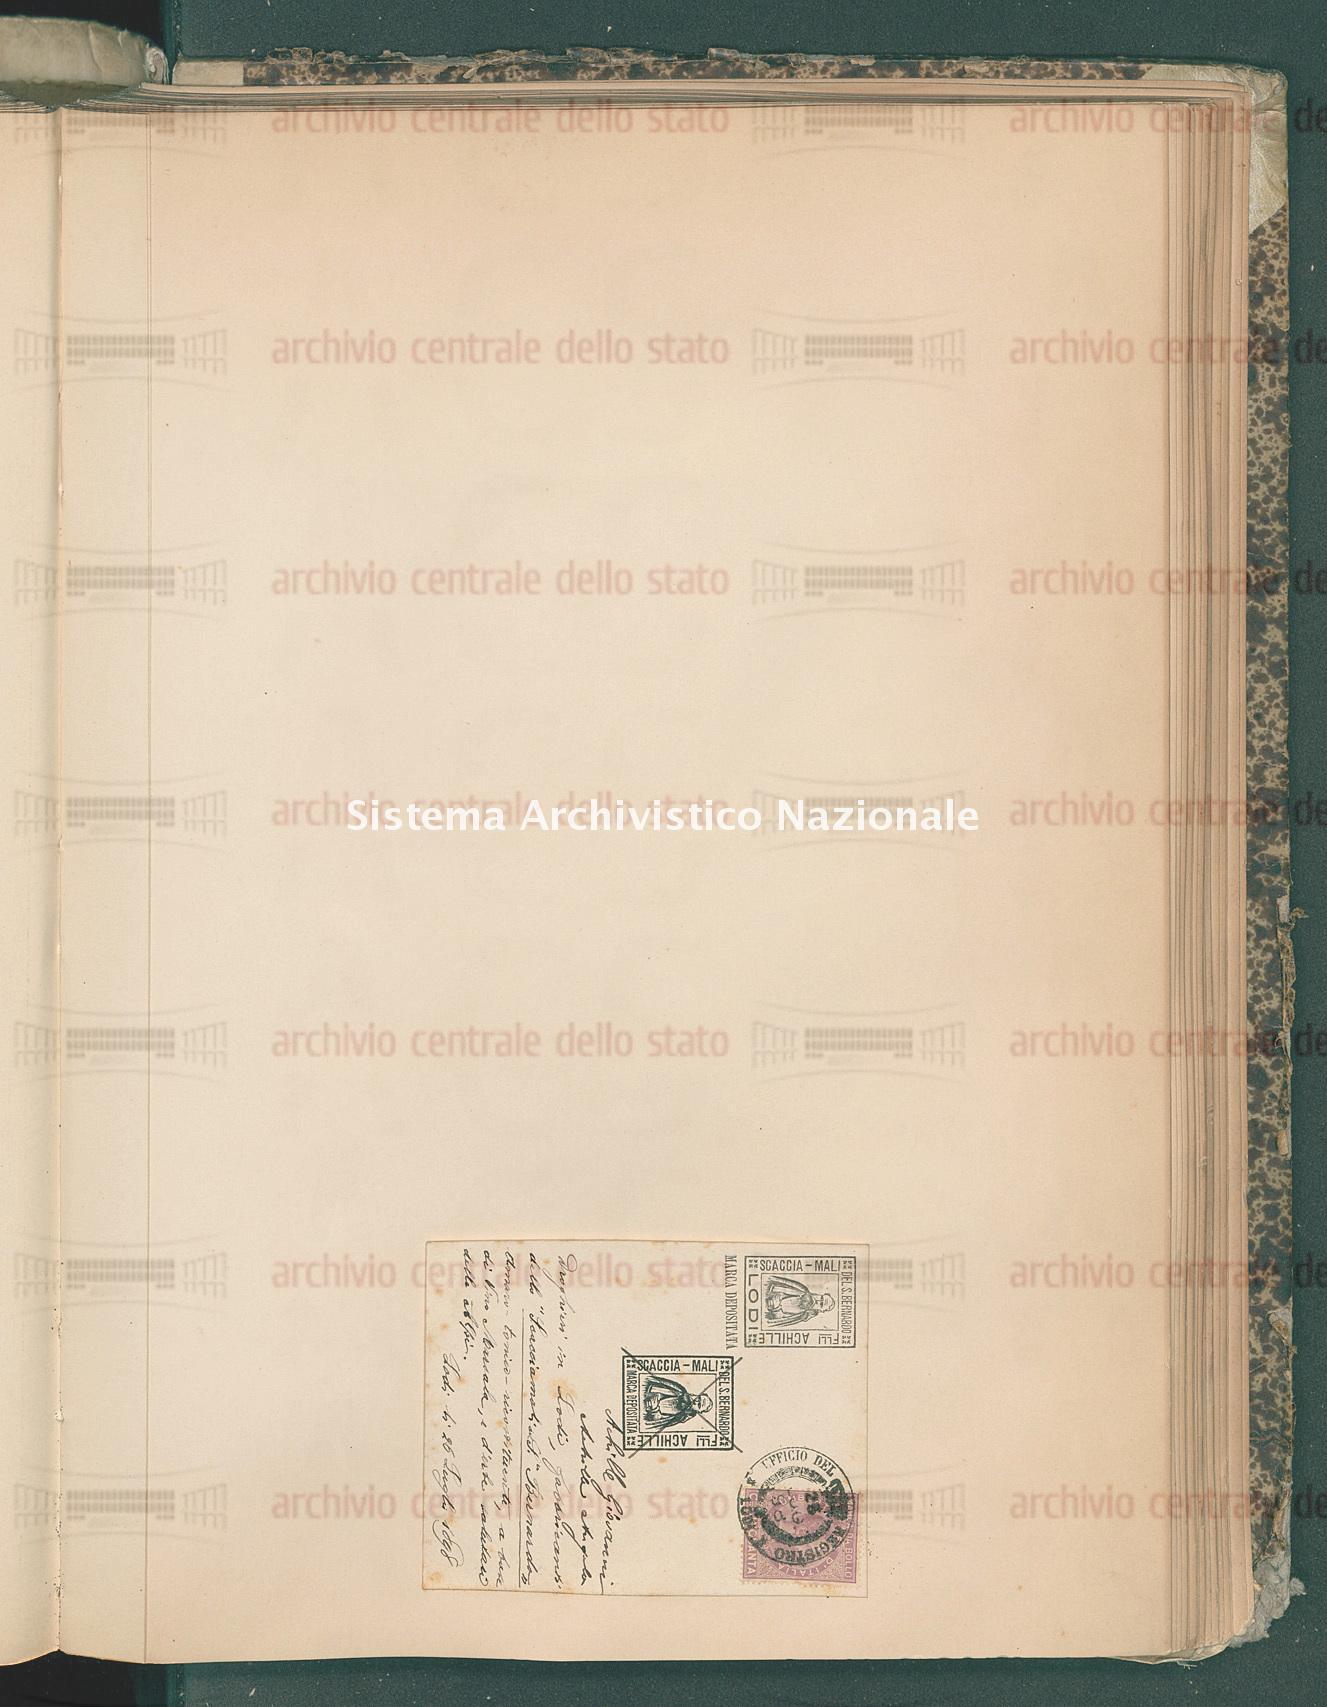 Achille Giovanni Ed Angelo Fratelli (29/11/1898)